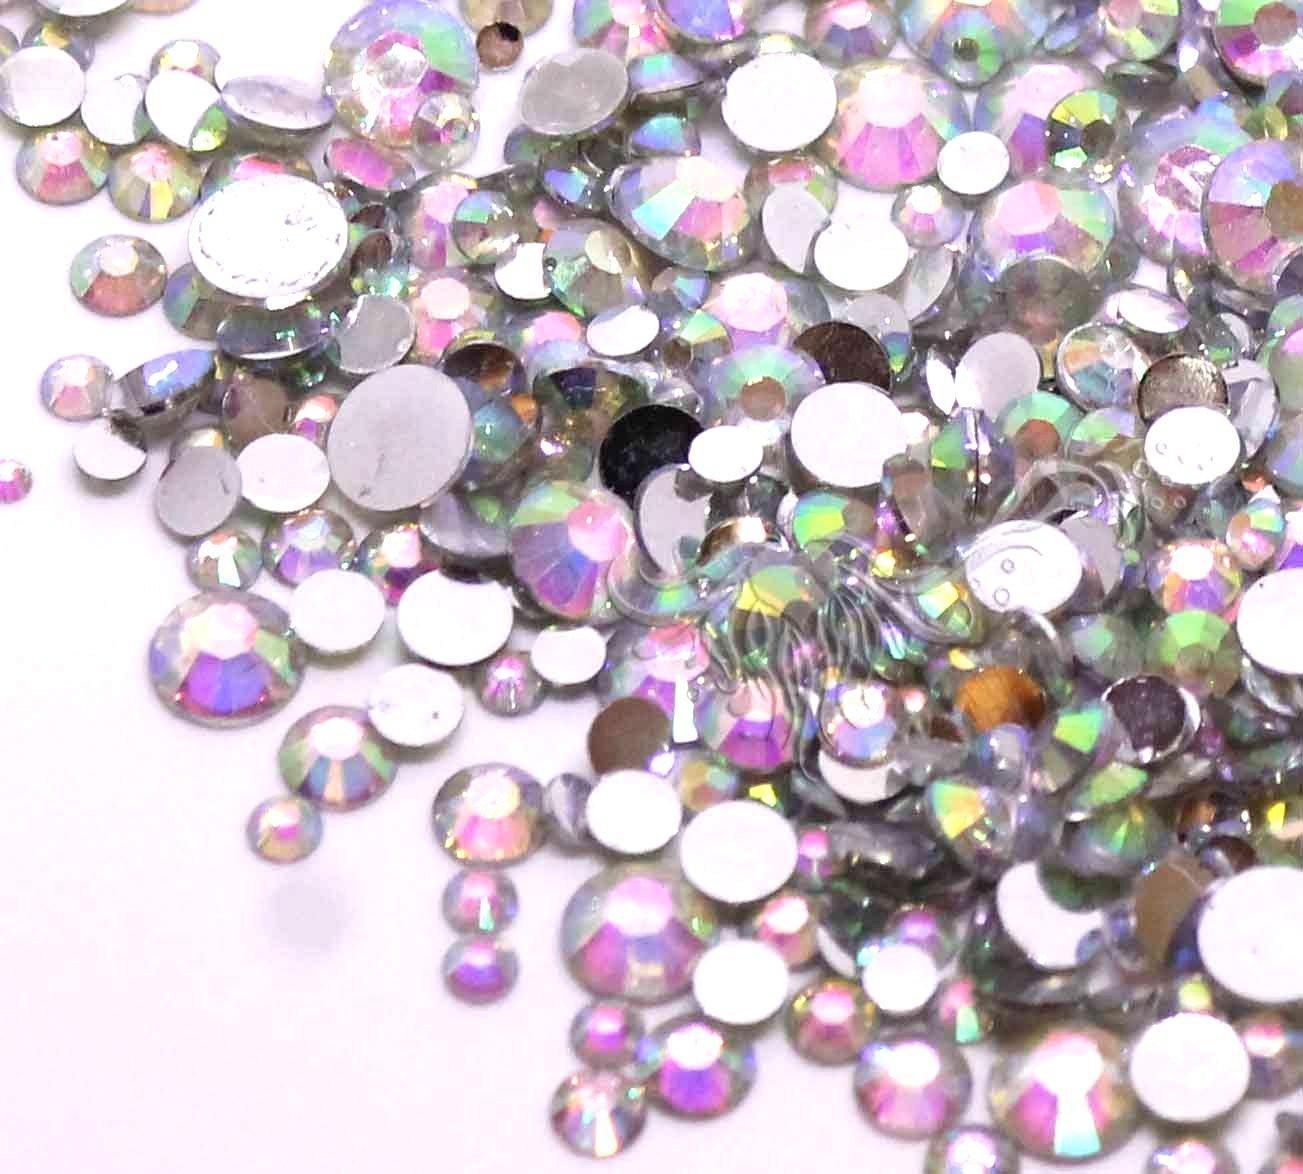 Stardust SHIMMERING OPAL SPECKS Jewels Mix